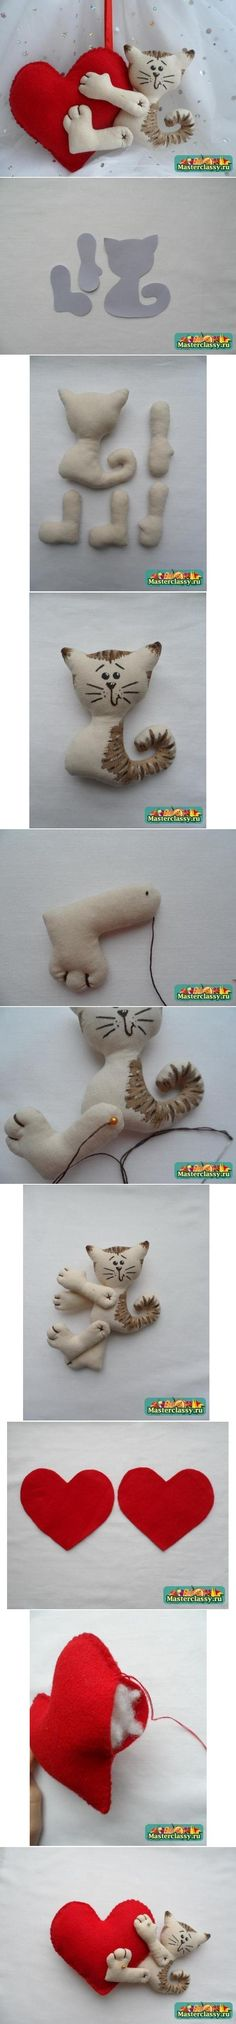 DIY Fabric Heart Kitten